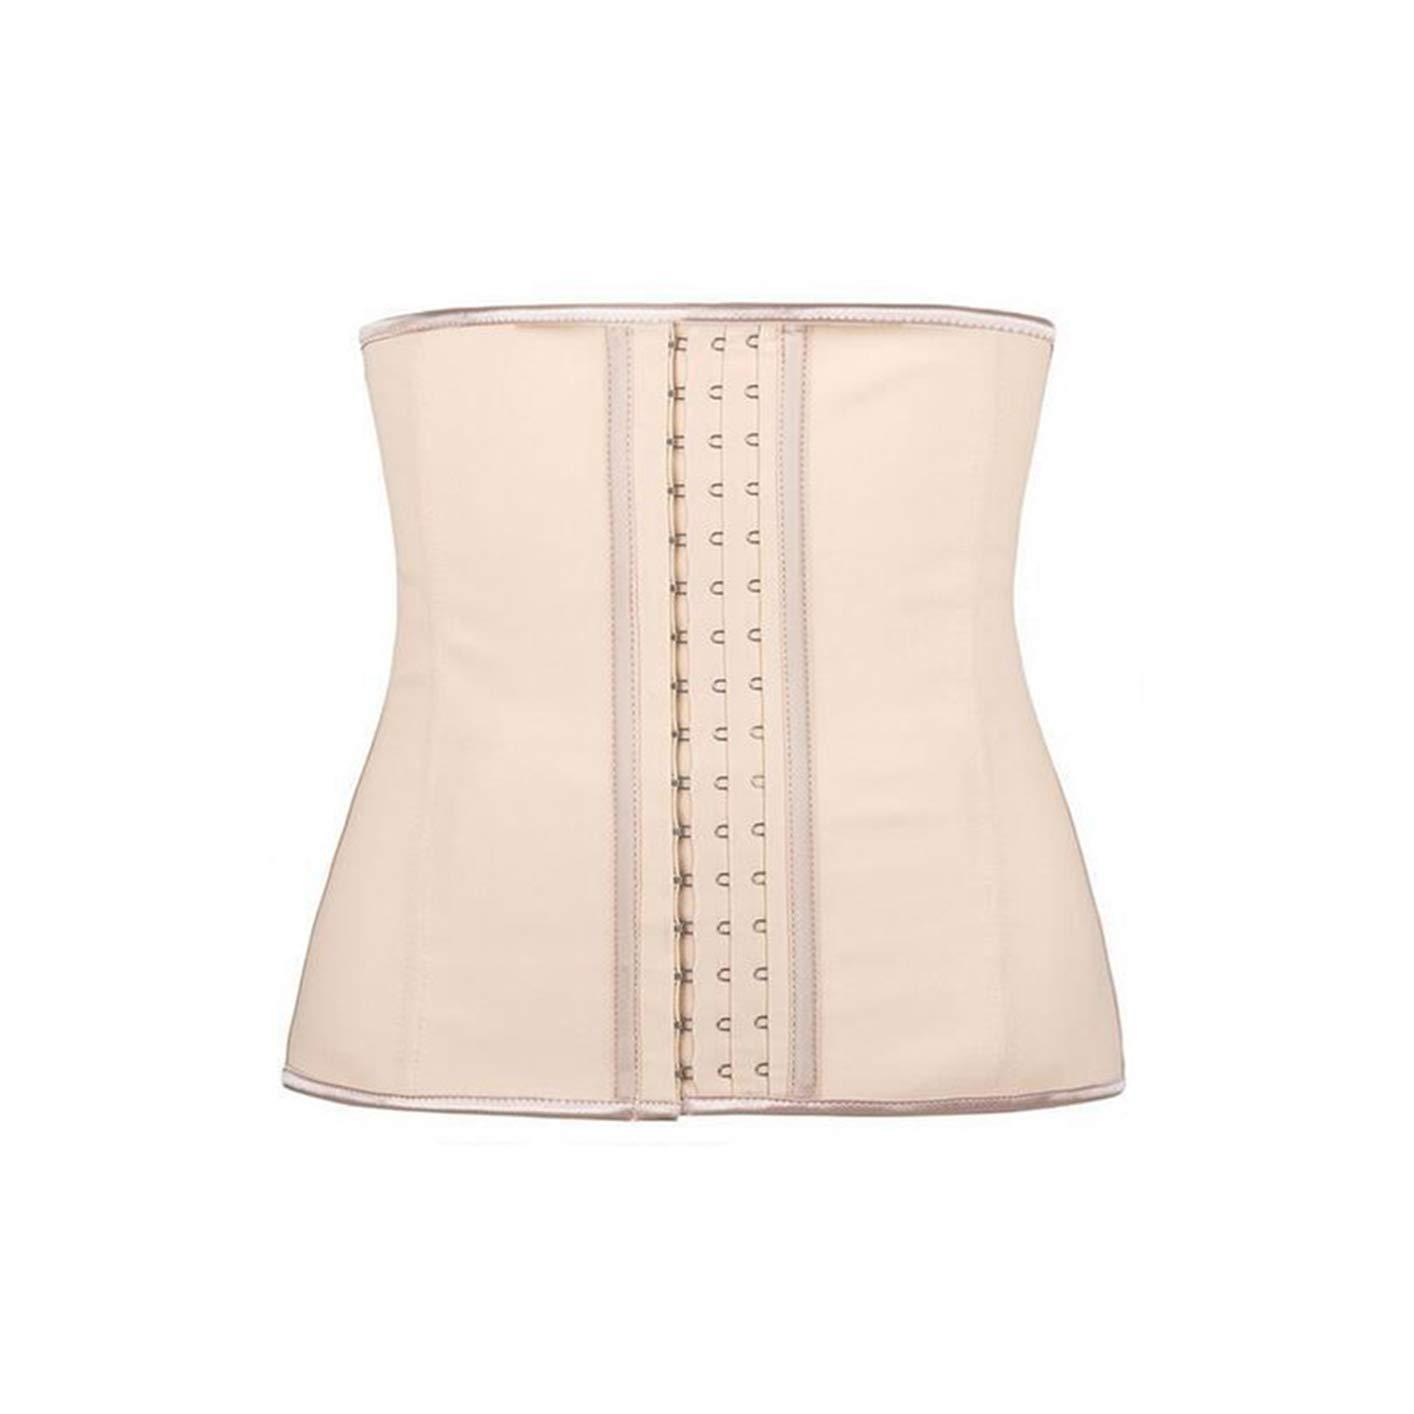 7f70067aaff Amazon.com  Latex Waist Cincher Trainer Tummy Control Slimming 9 Steel Bones  Belt Corset Plus Size XS-6XL  Clothing